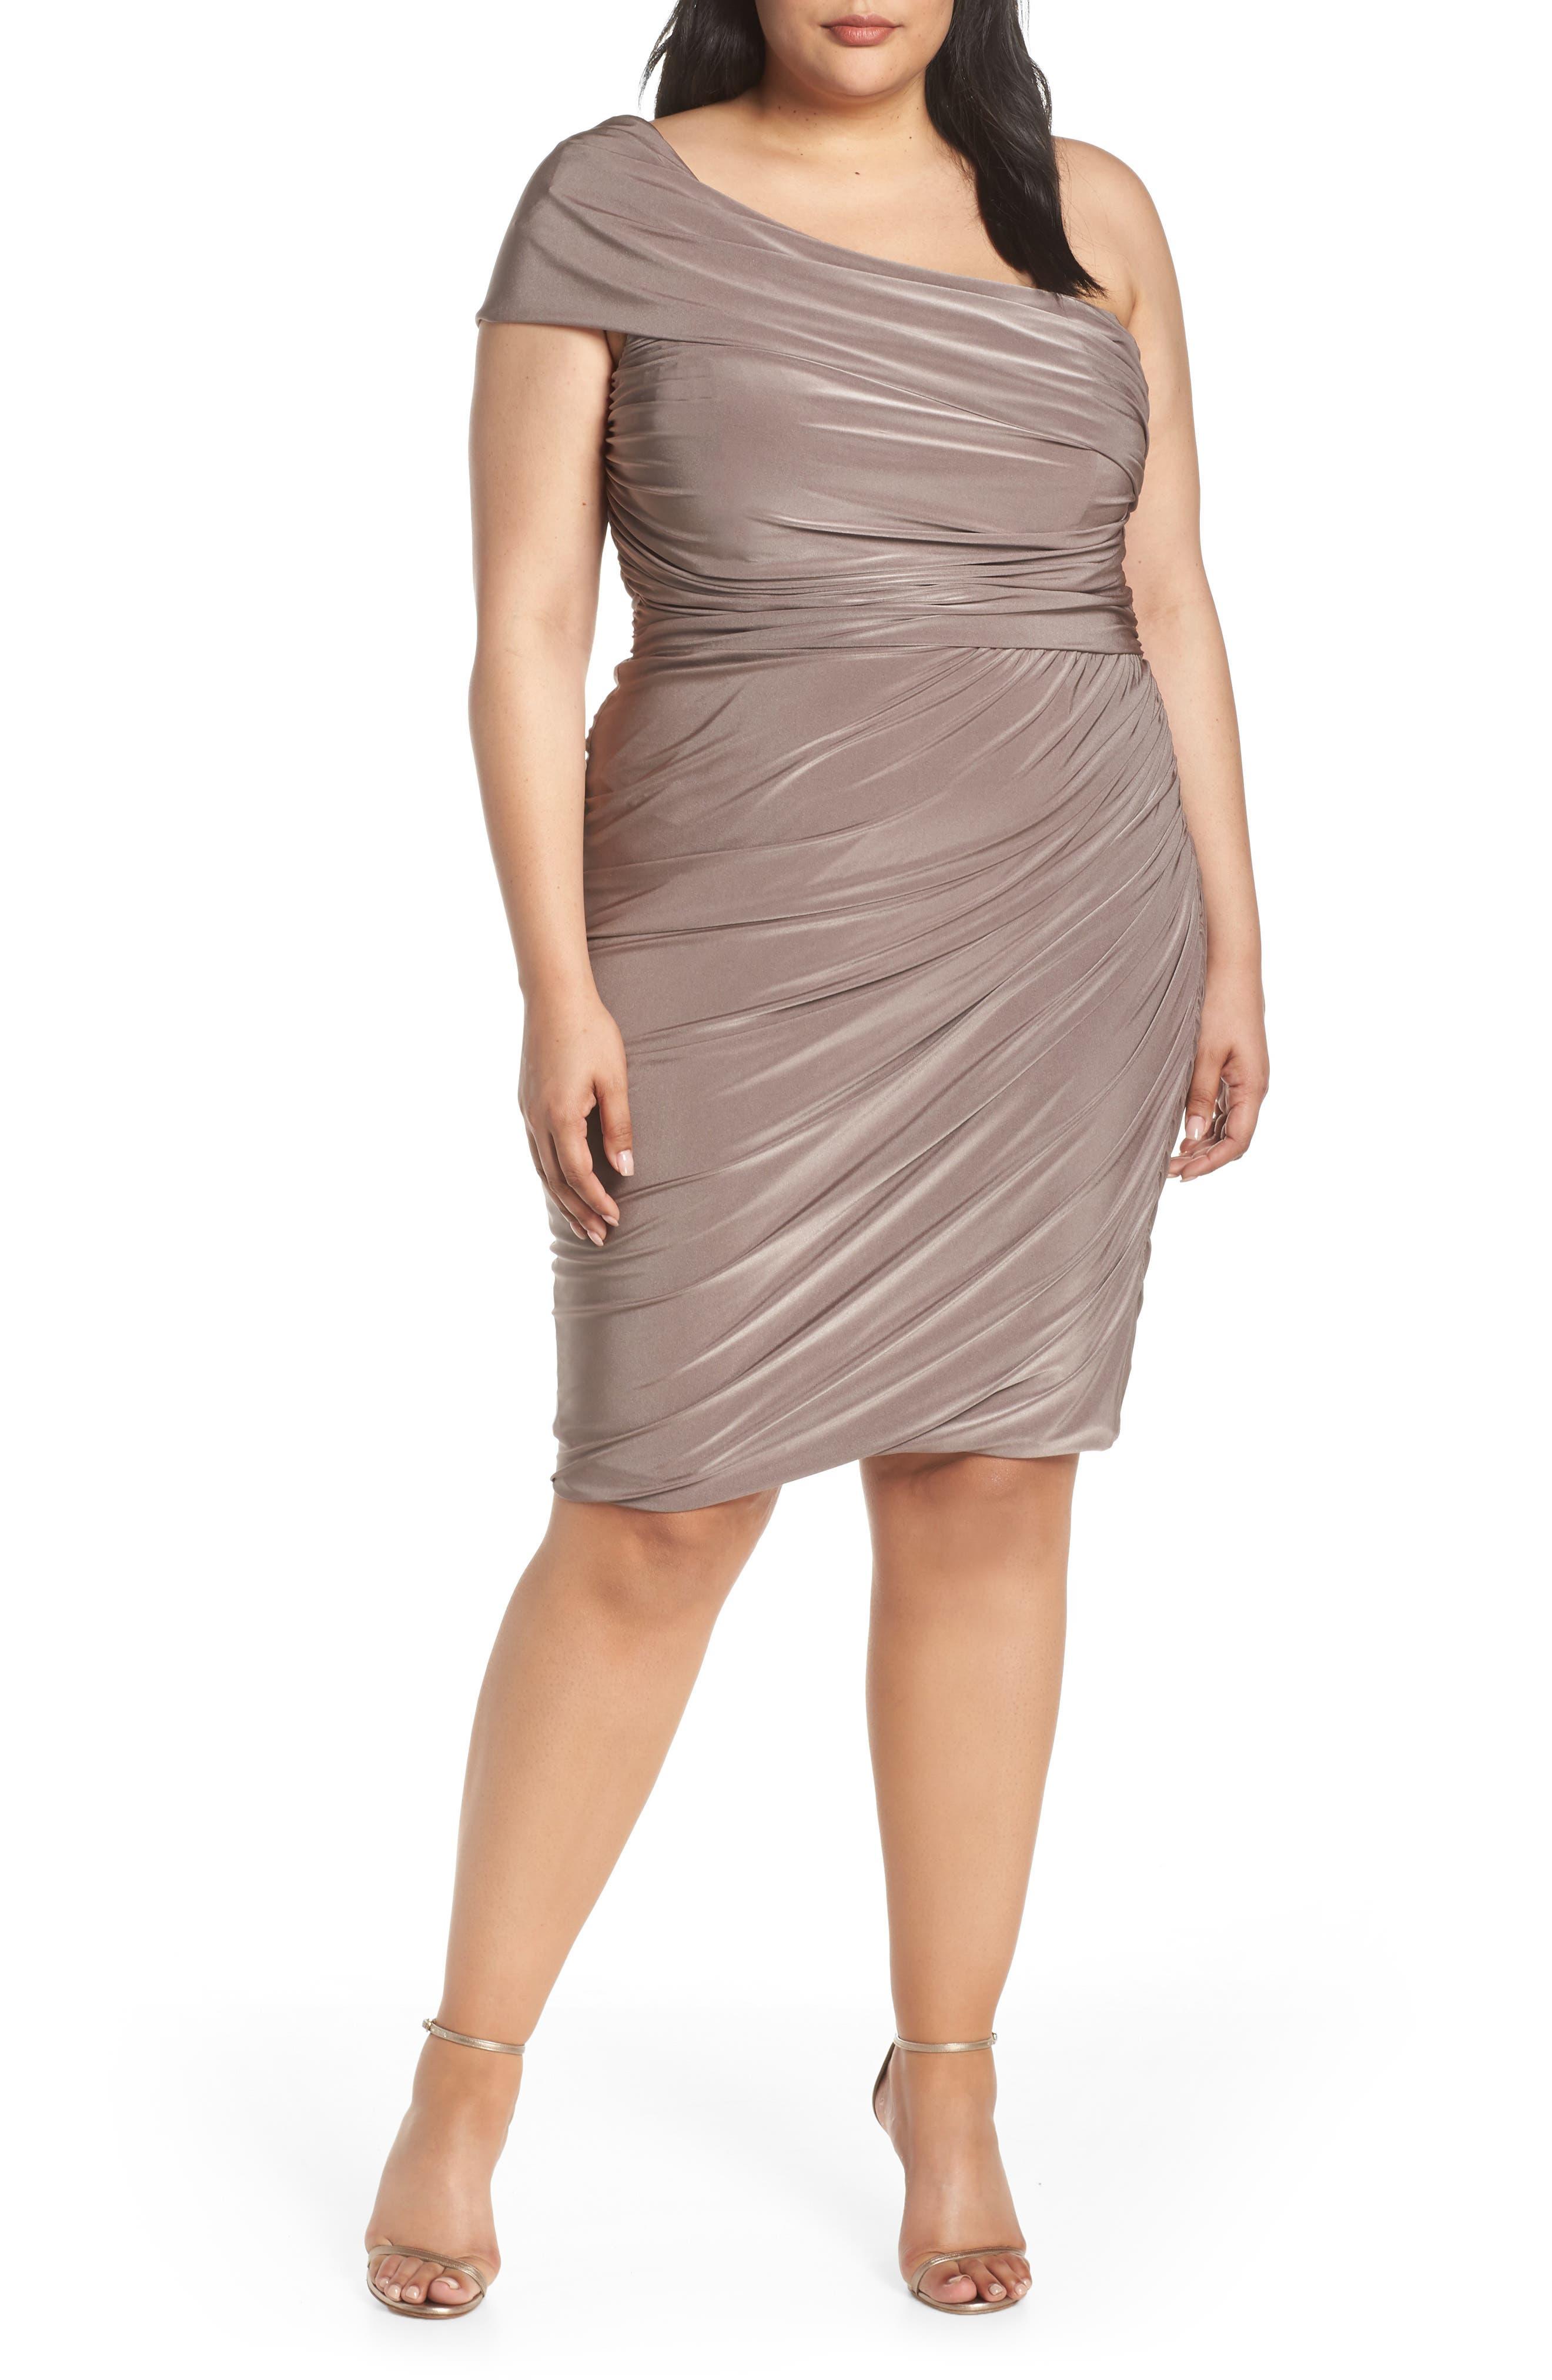 Plus Size Eliza J Ruched One-Shoulder Body-Con Cocktail Dress, Beige